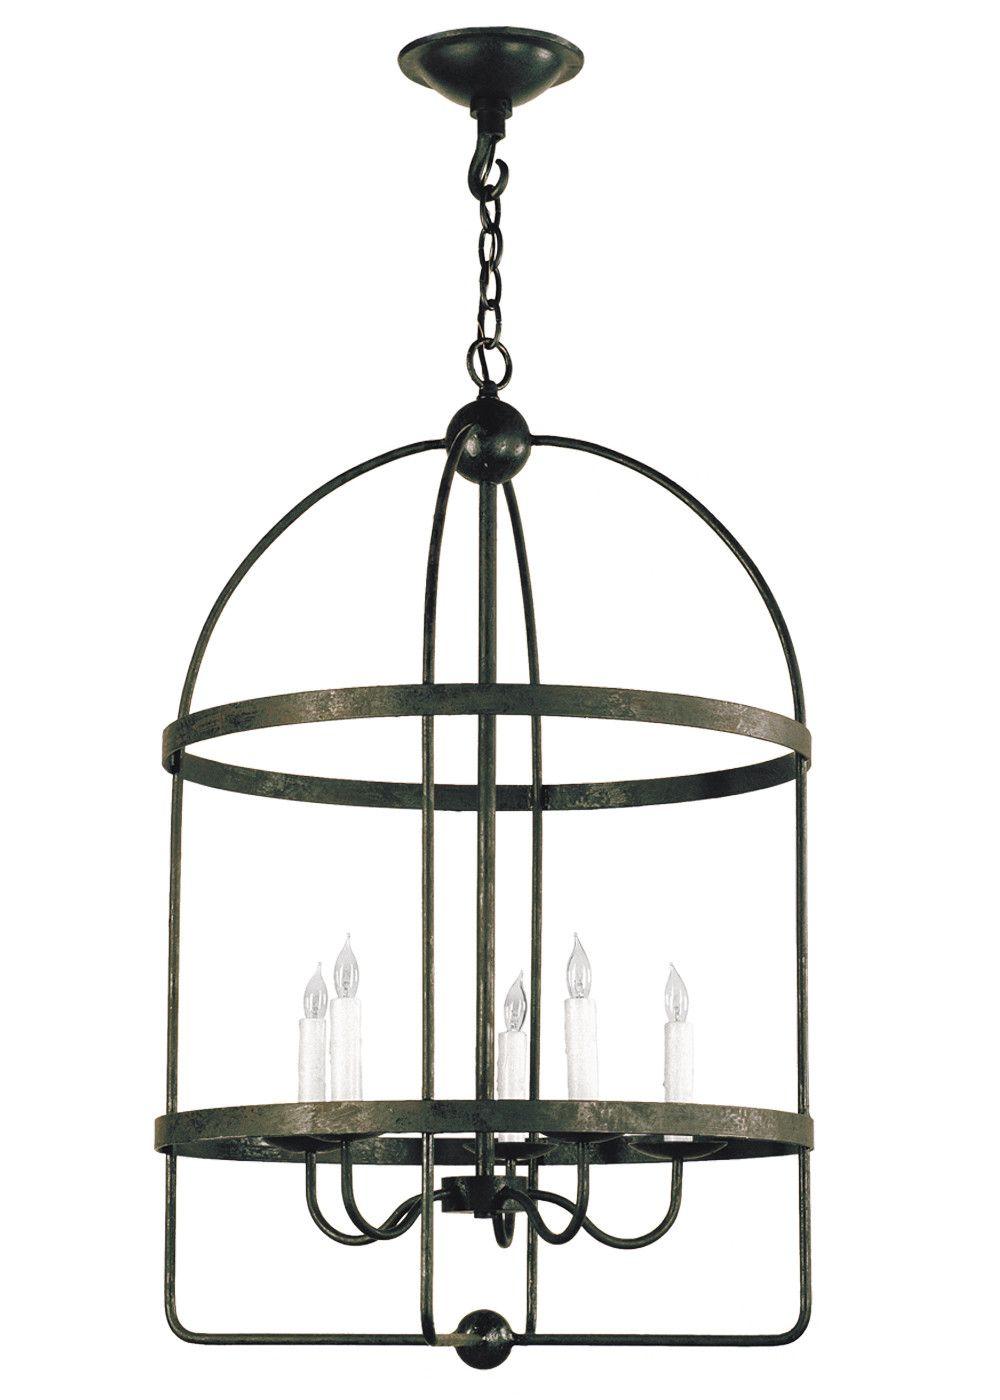 lighting lantern pin karlin hall by fournir chandeliers companies interiors dessin